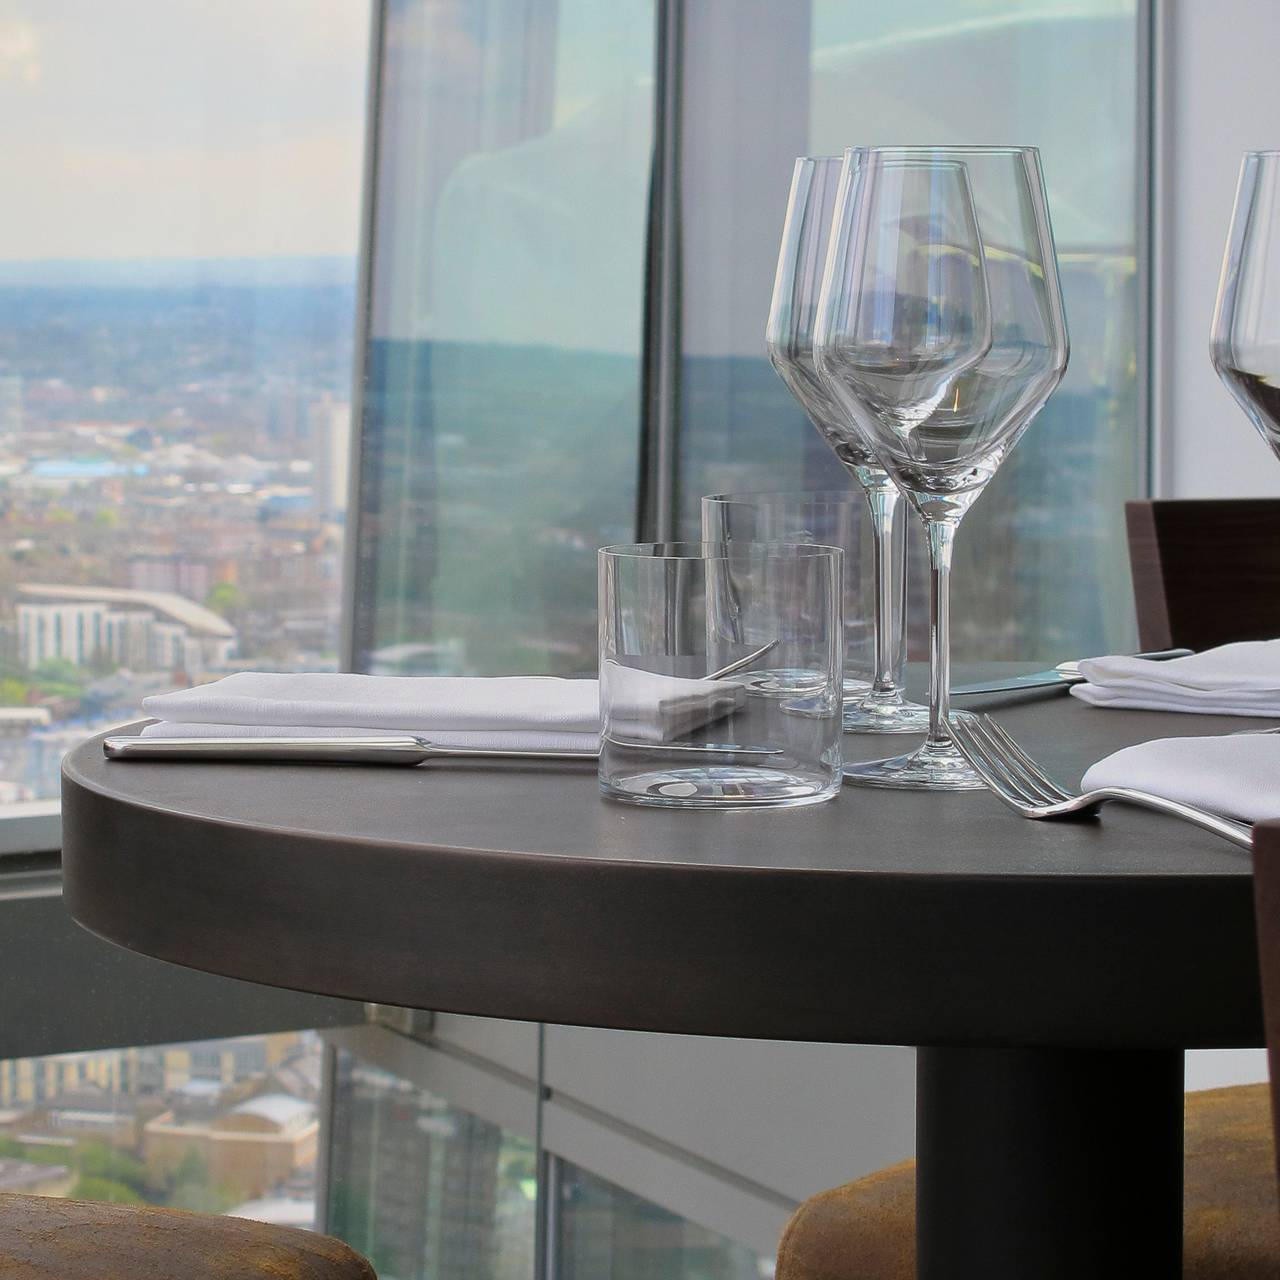 Oblix West Restaurant - London, | OpenTable